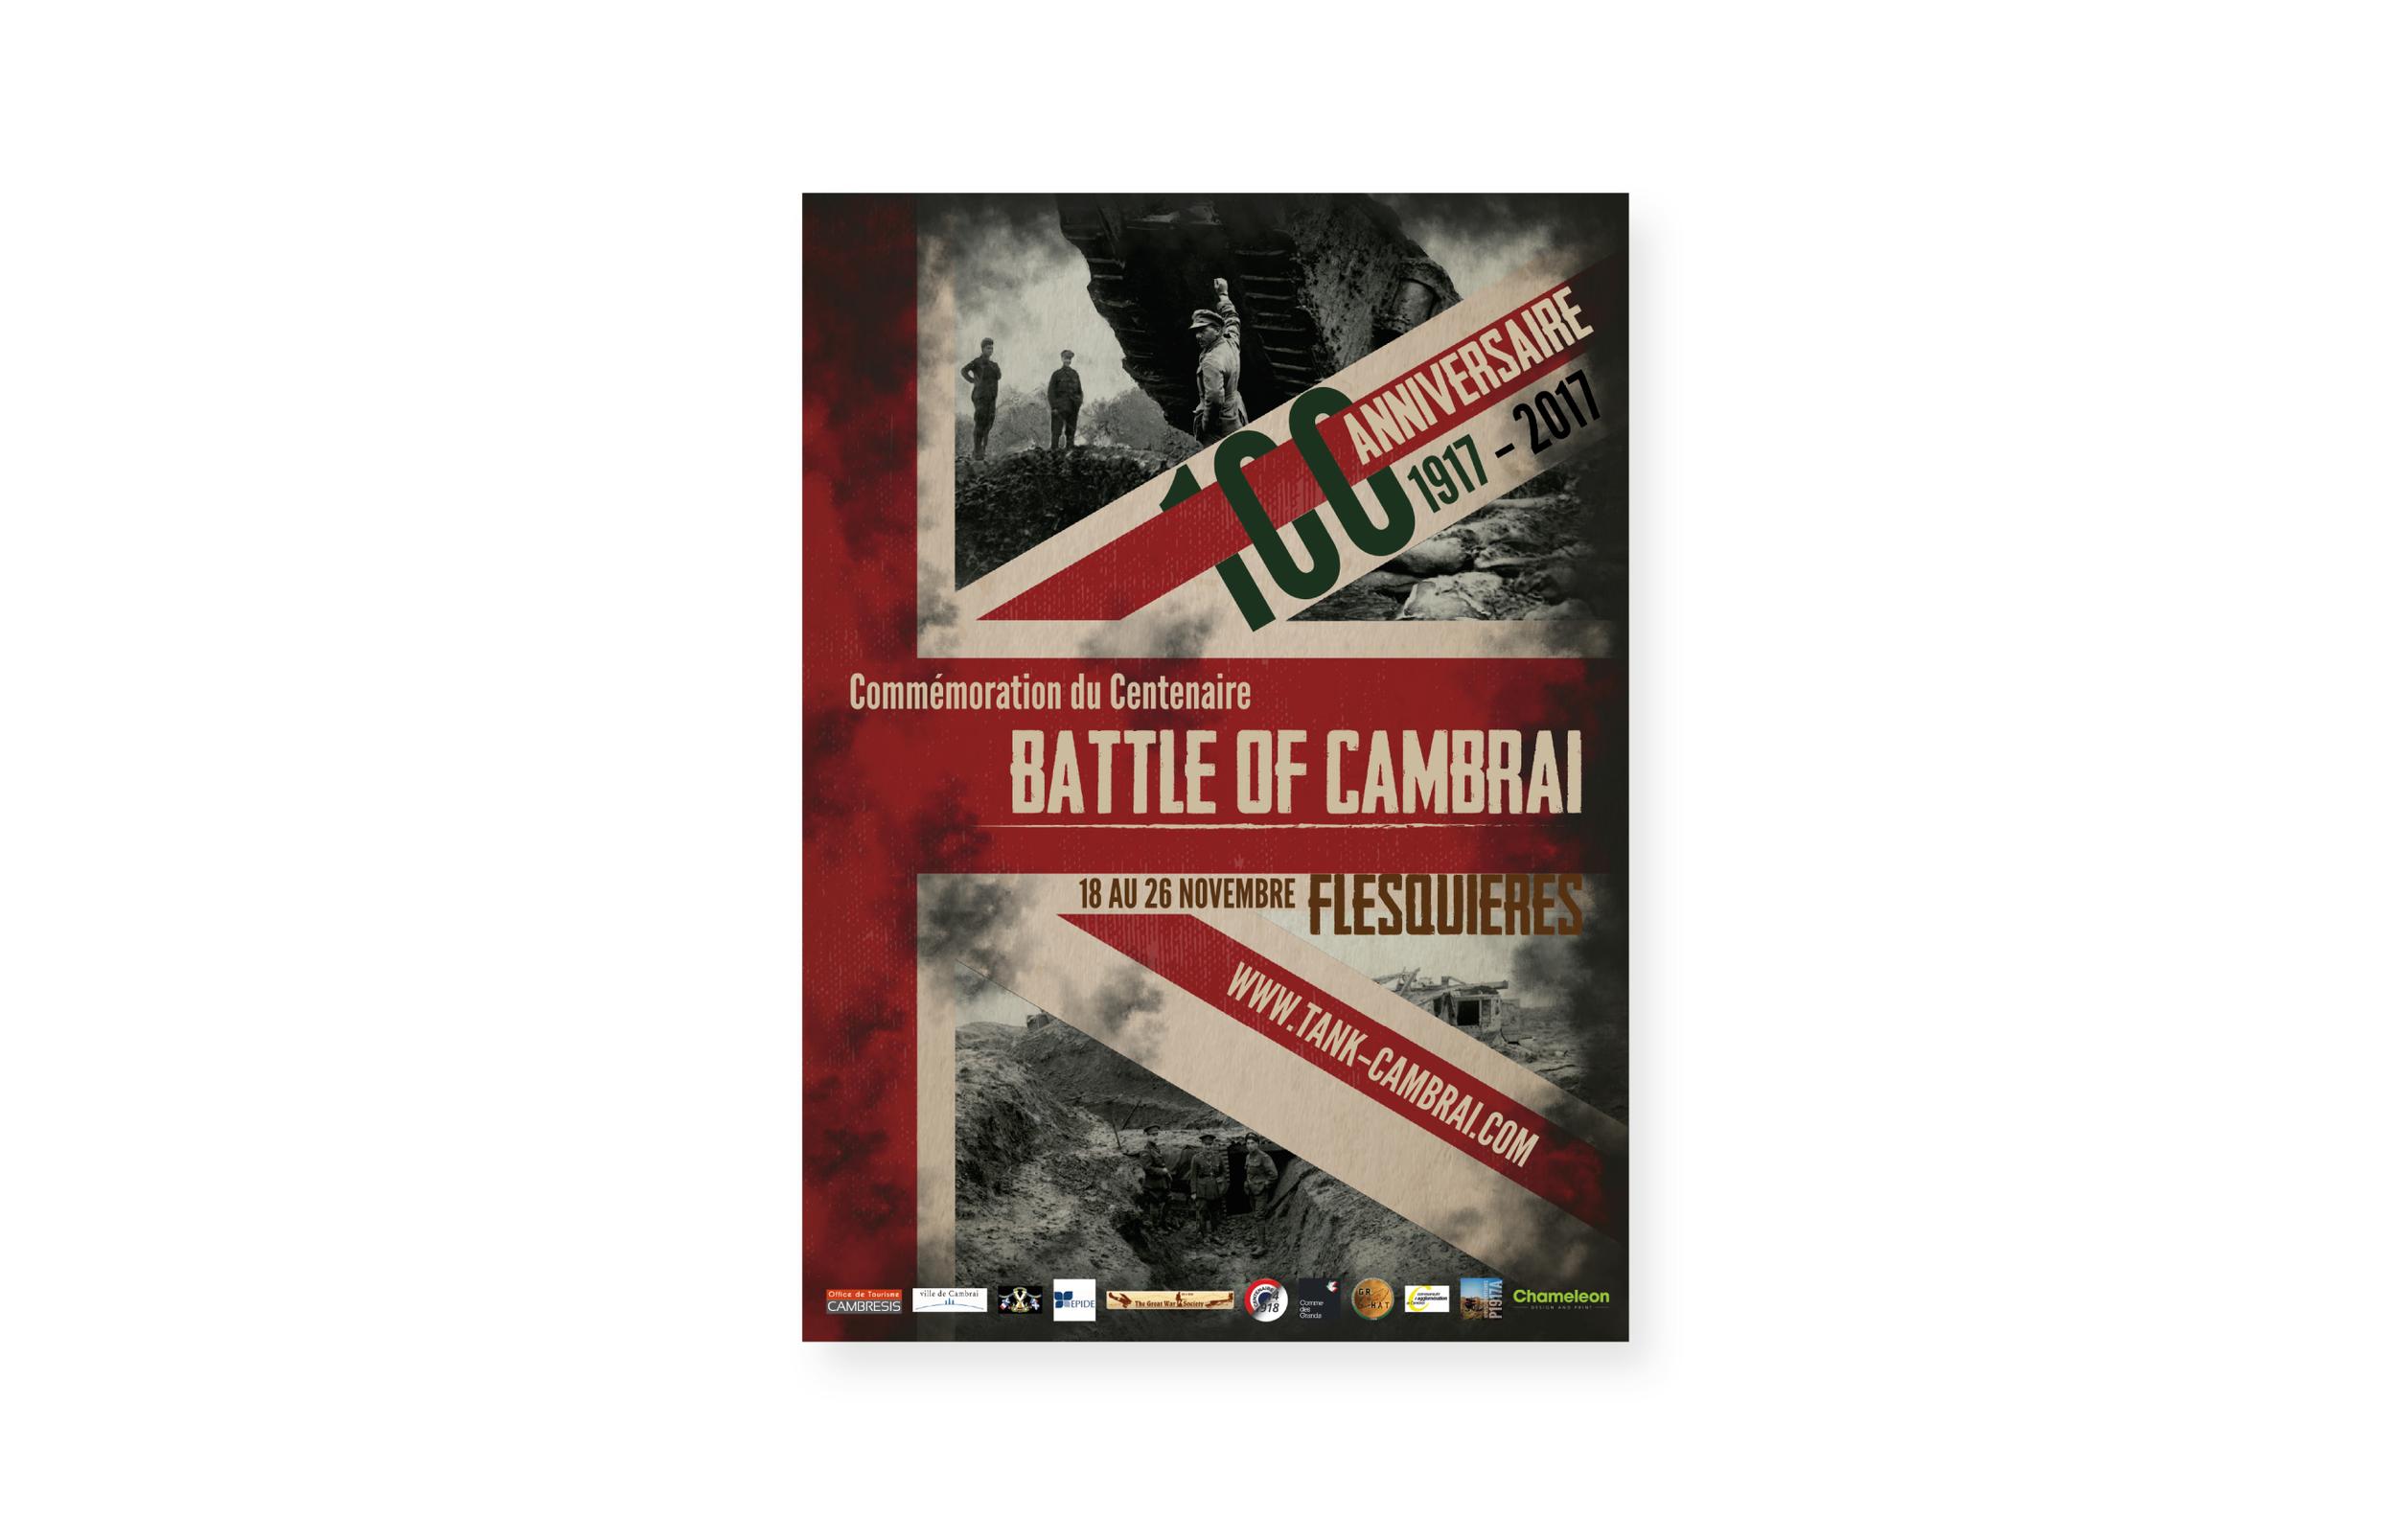 Battle of Cambrai - Centenary Poster Design